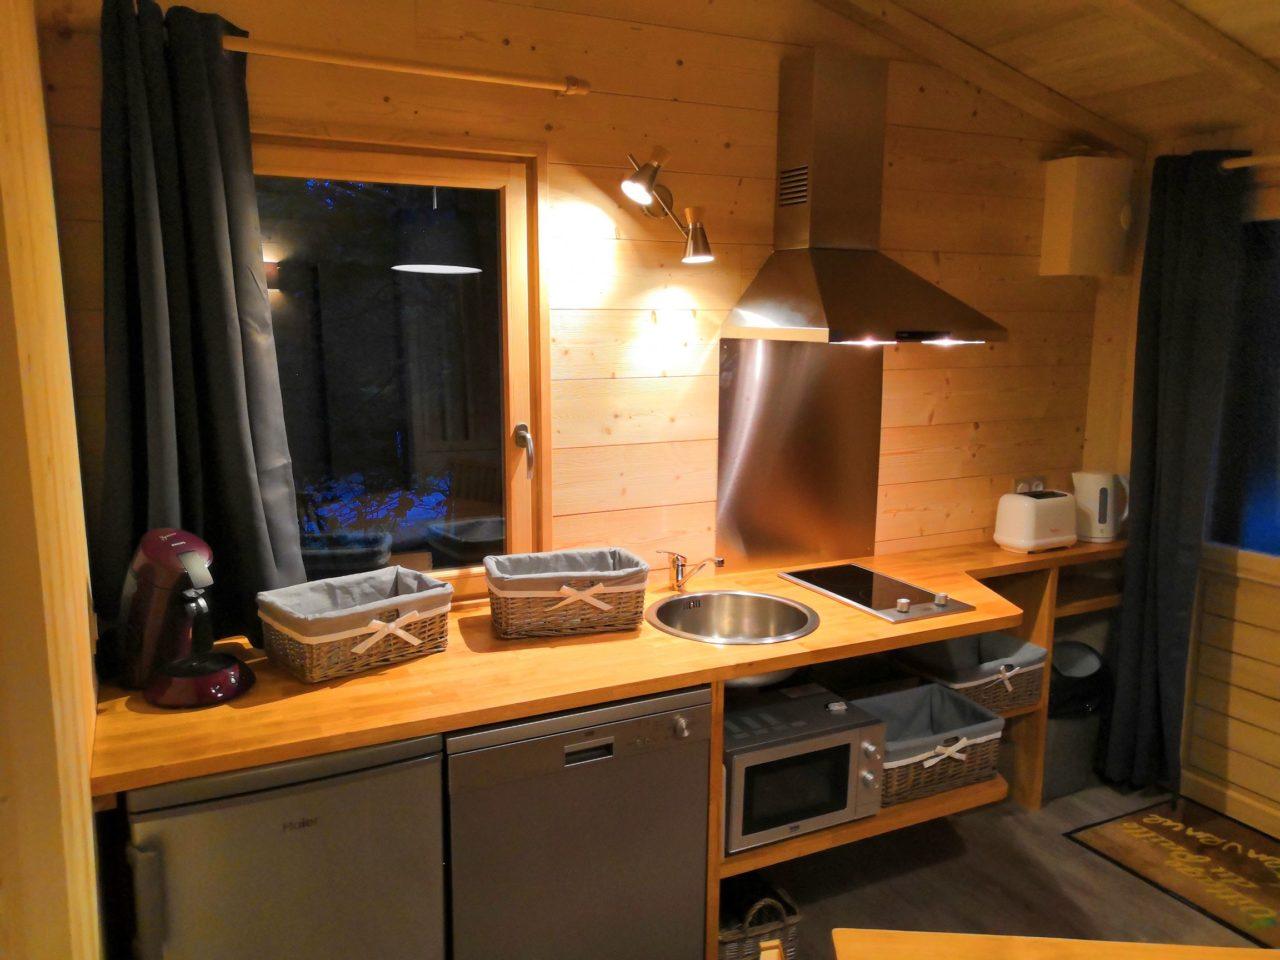 cuisine cosy cabane insolite avec sauna hammam spa jacuzzi Sarlat Dordogne